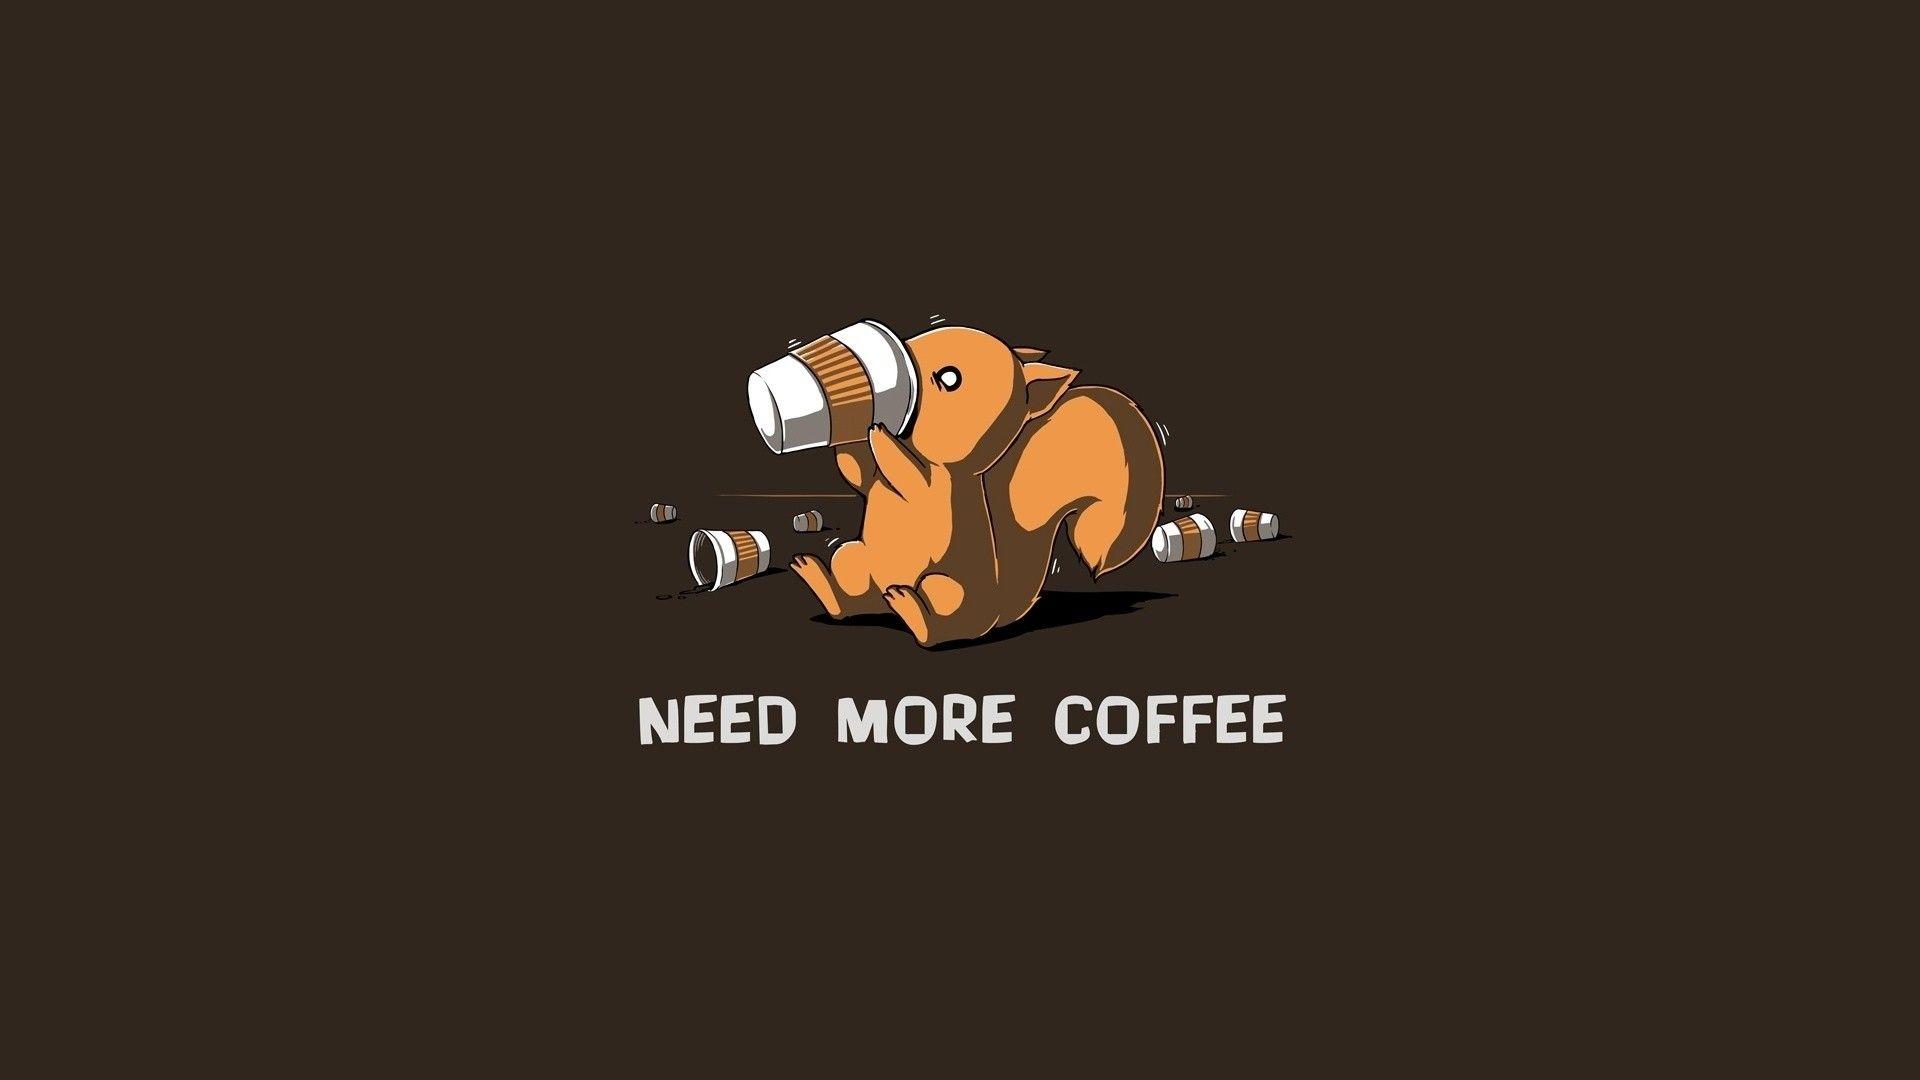 picture of coffee mug